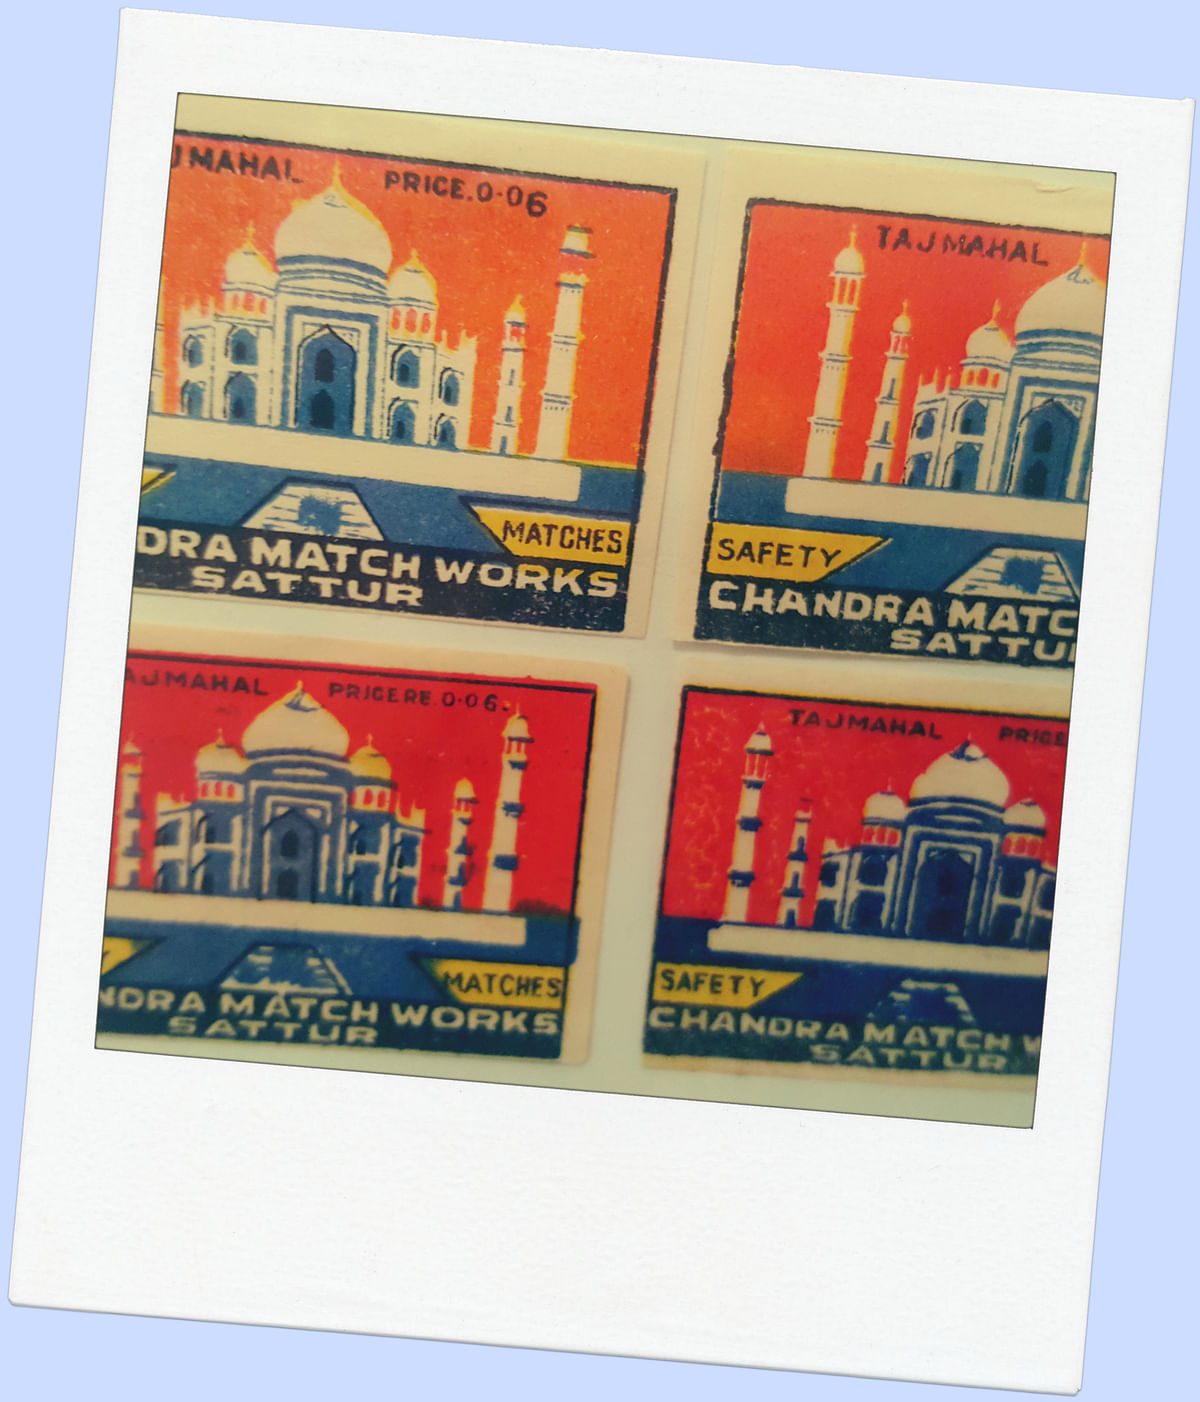 Taj Mahal matchbox covers. (Photo: <b>The Quint</b>)